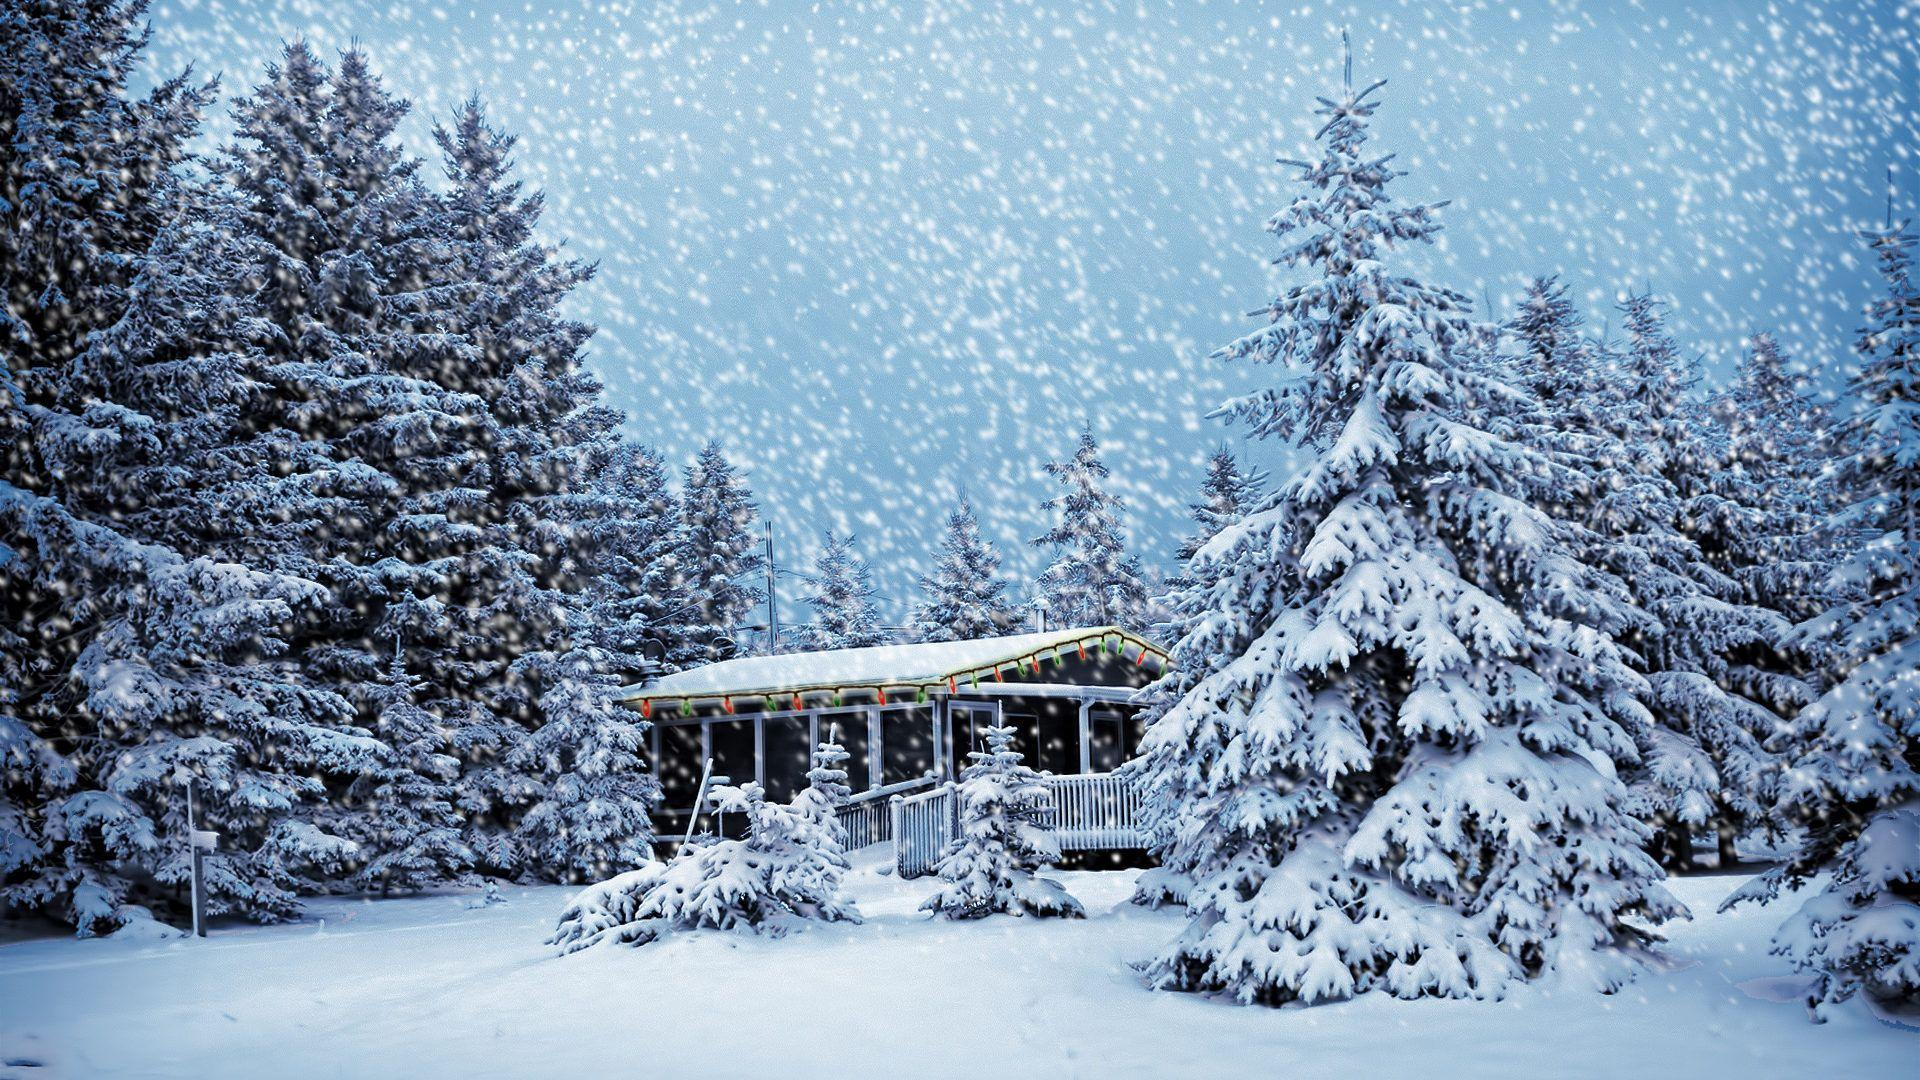 Christmas Snow wallpaper – Innovative Picture design Ideas